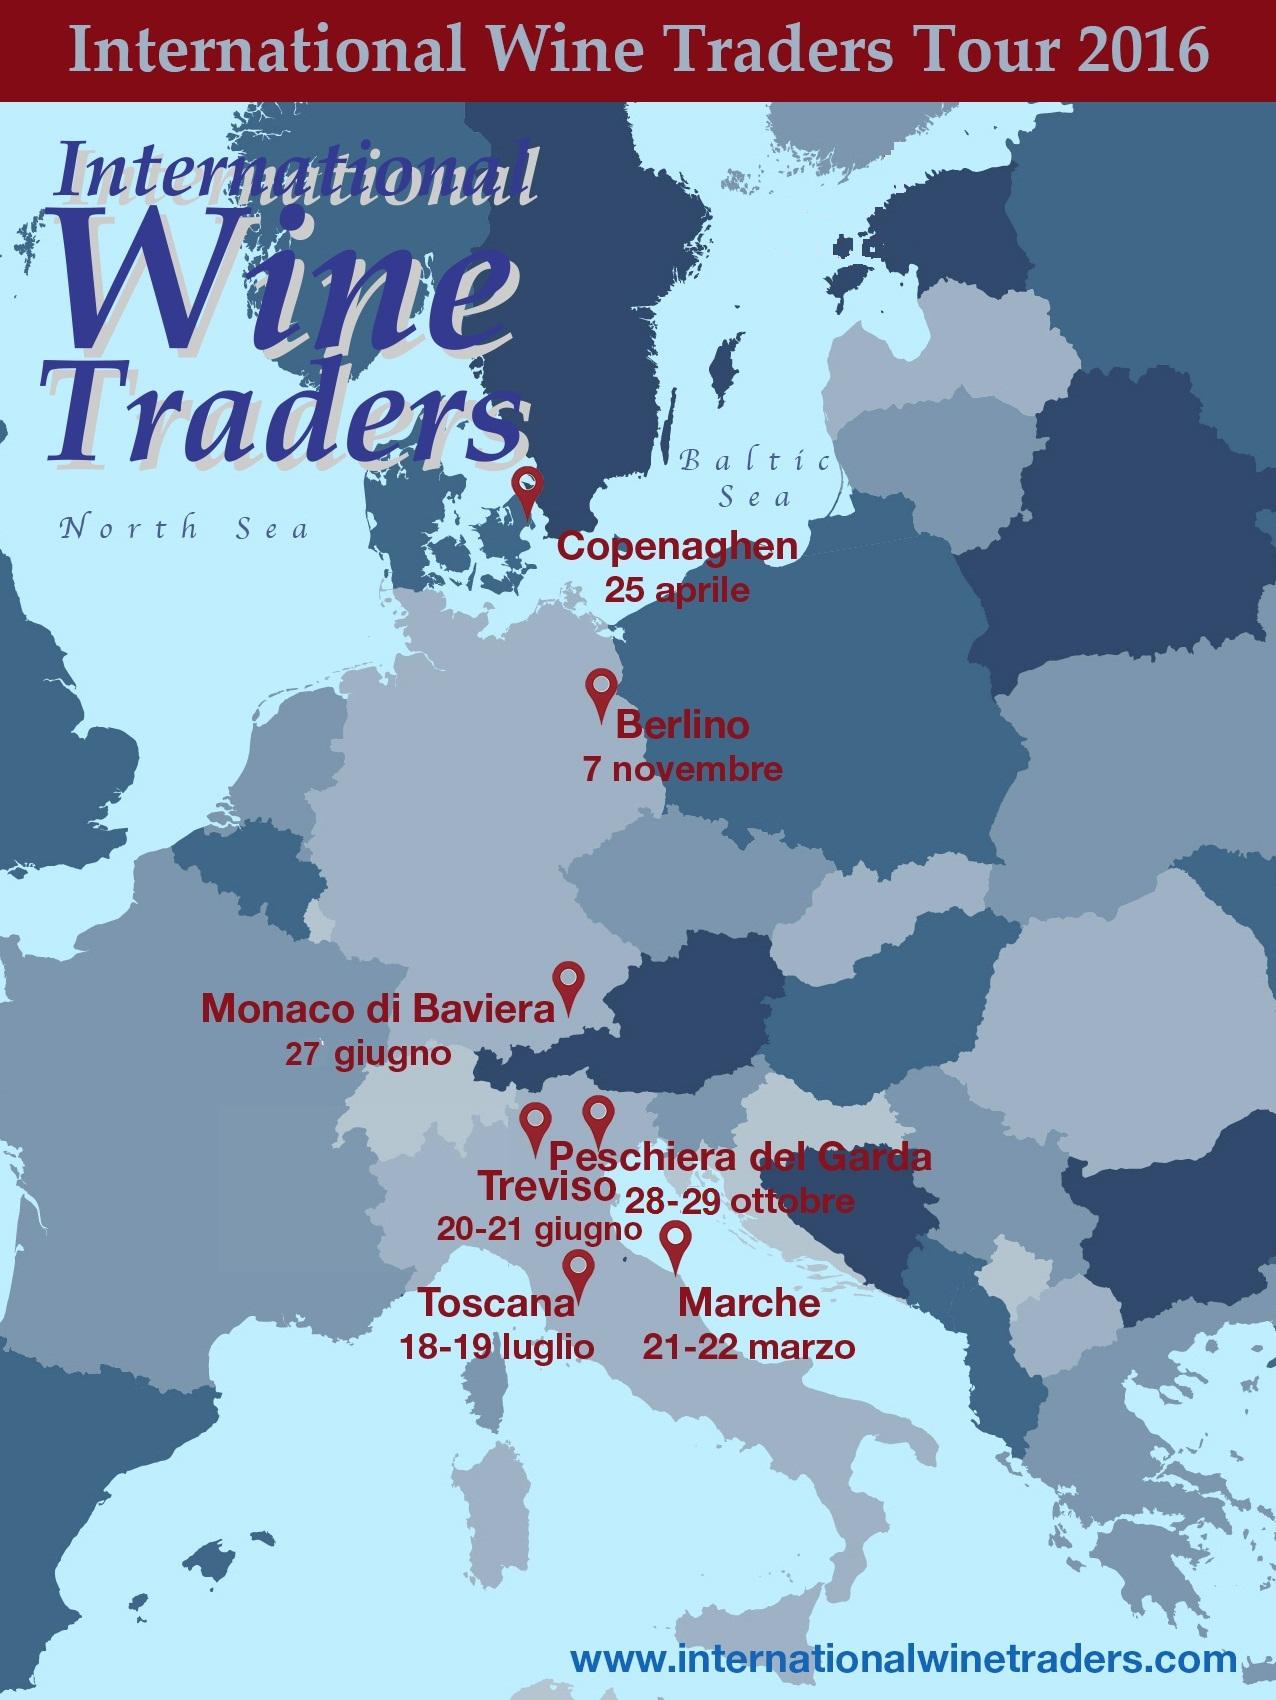 mappa europa iwt_2016_04